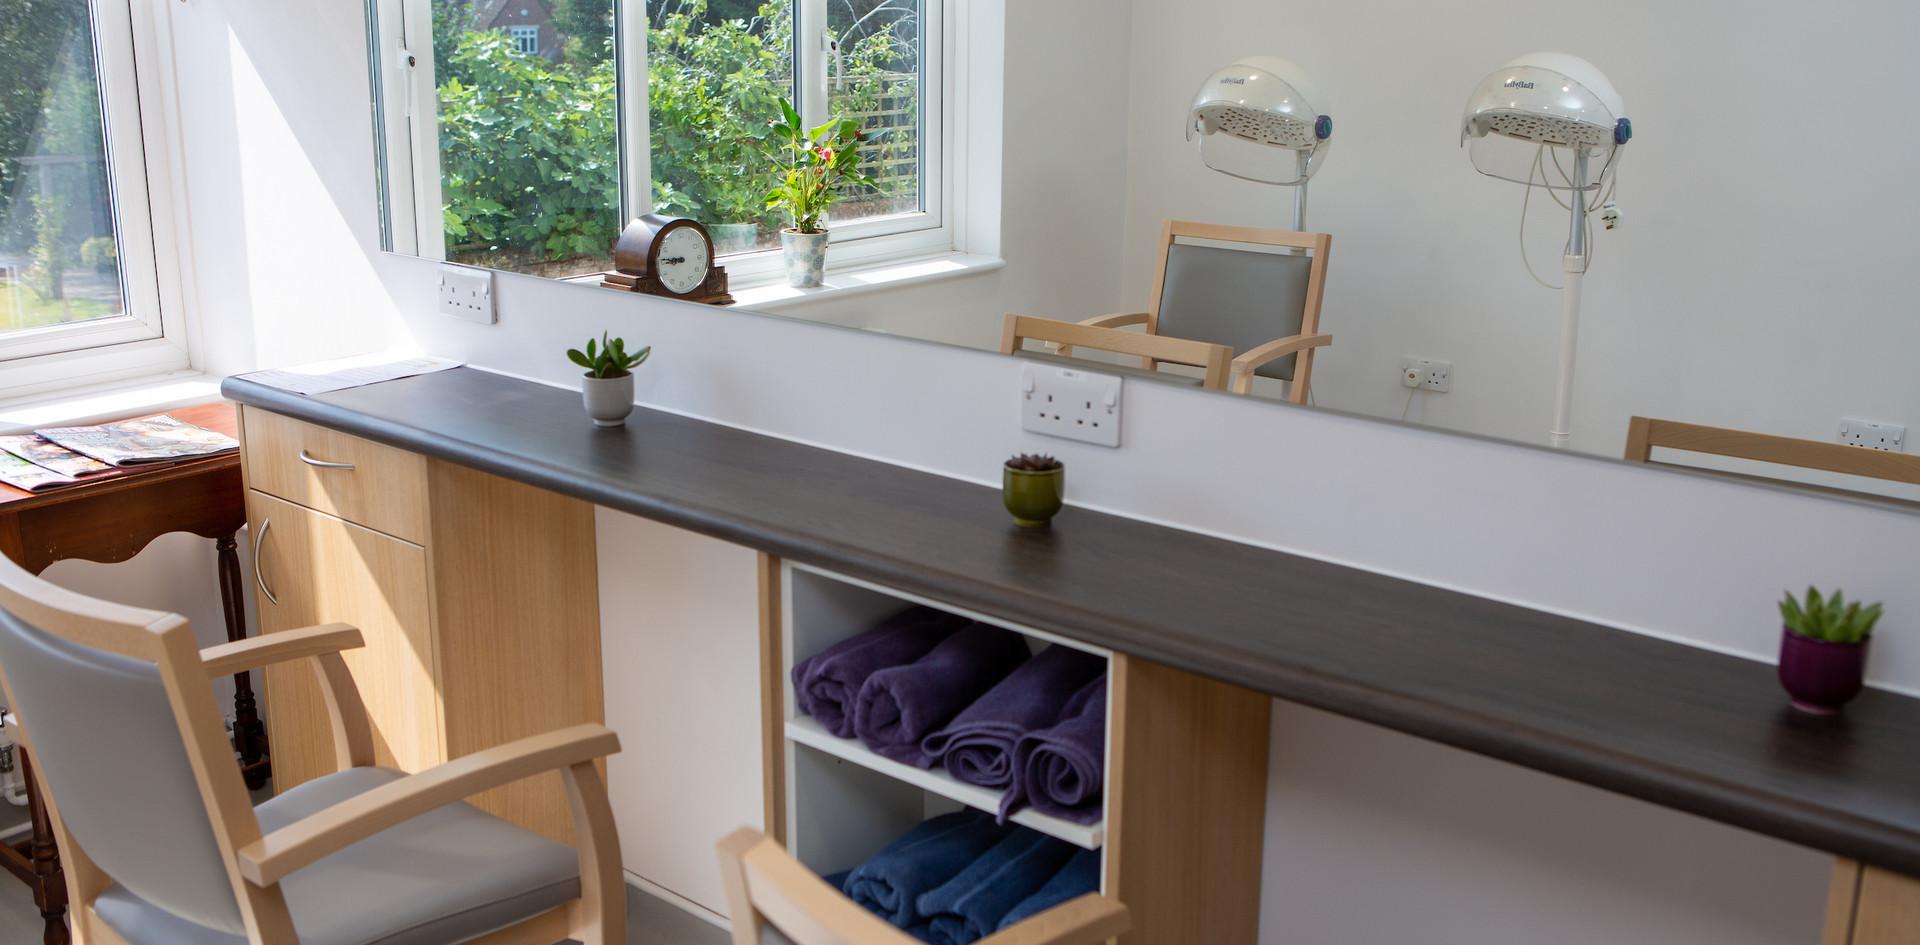 Salon towels on shelf.jpg